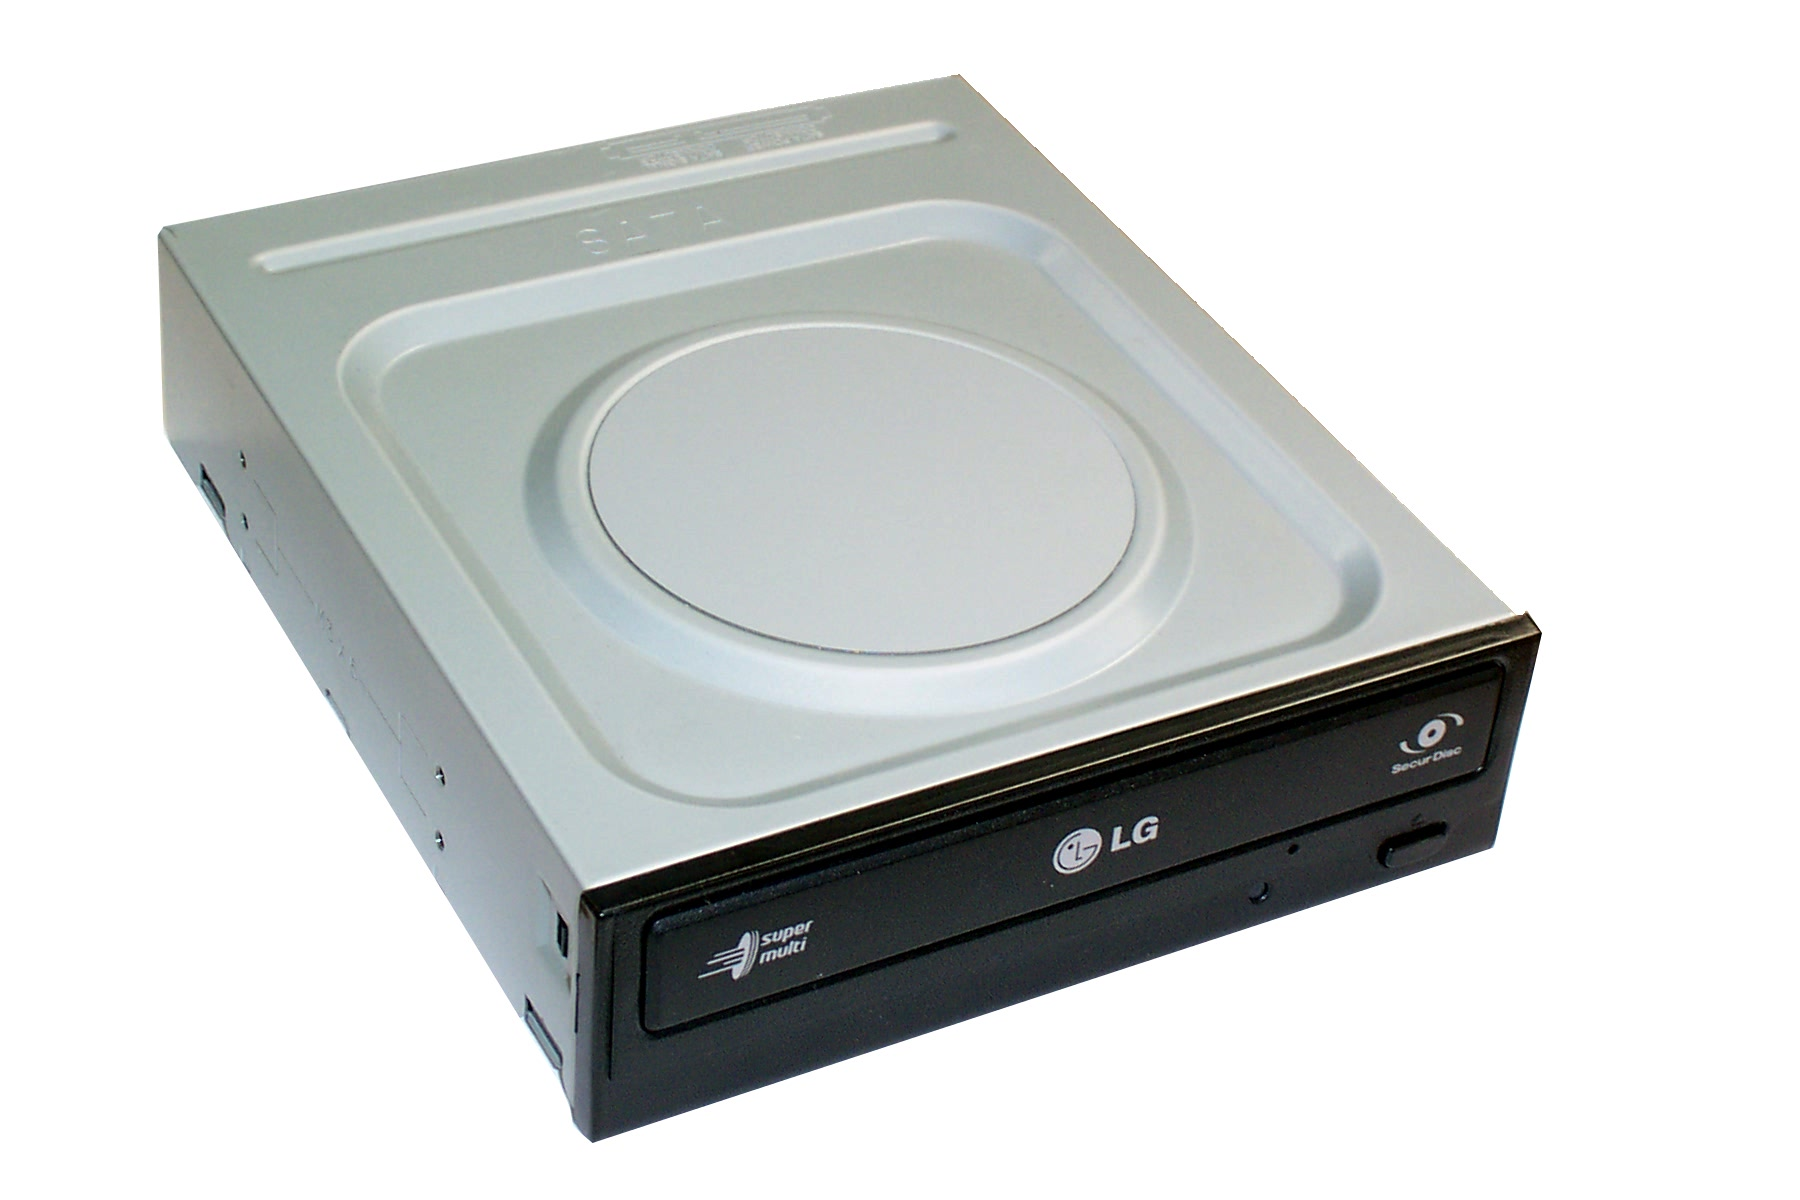 Lg Super Multi External Dvd Rewriter Driver Download